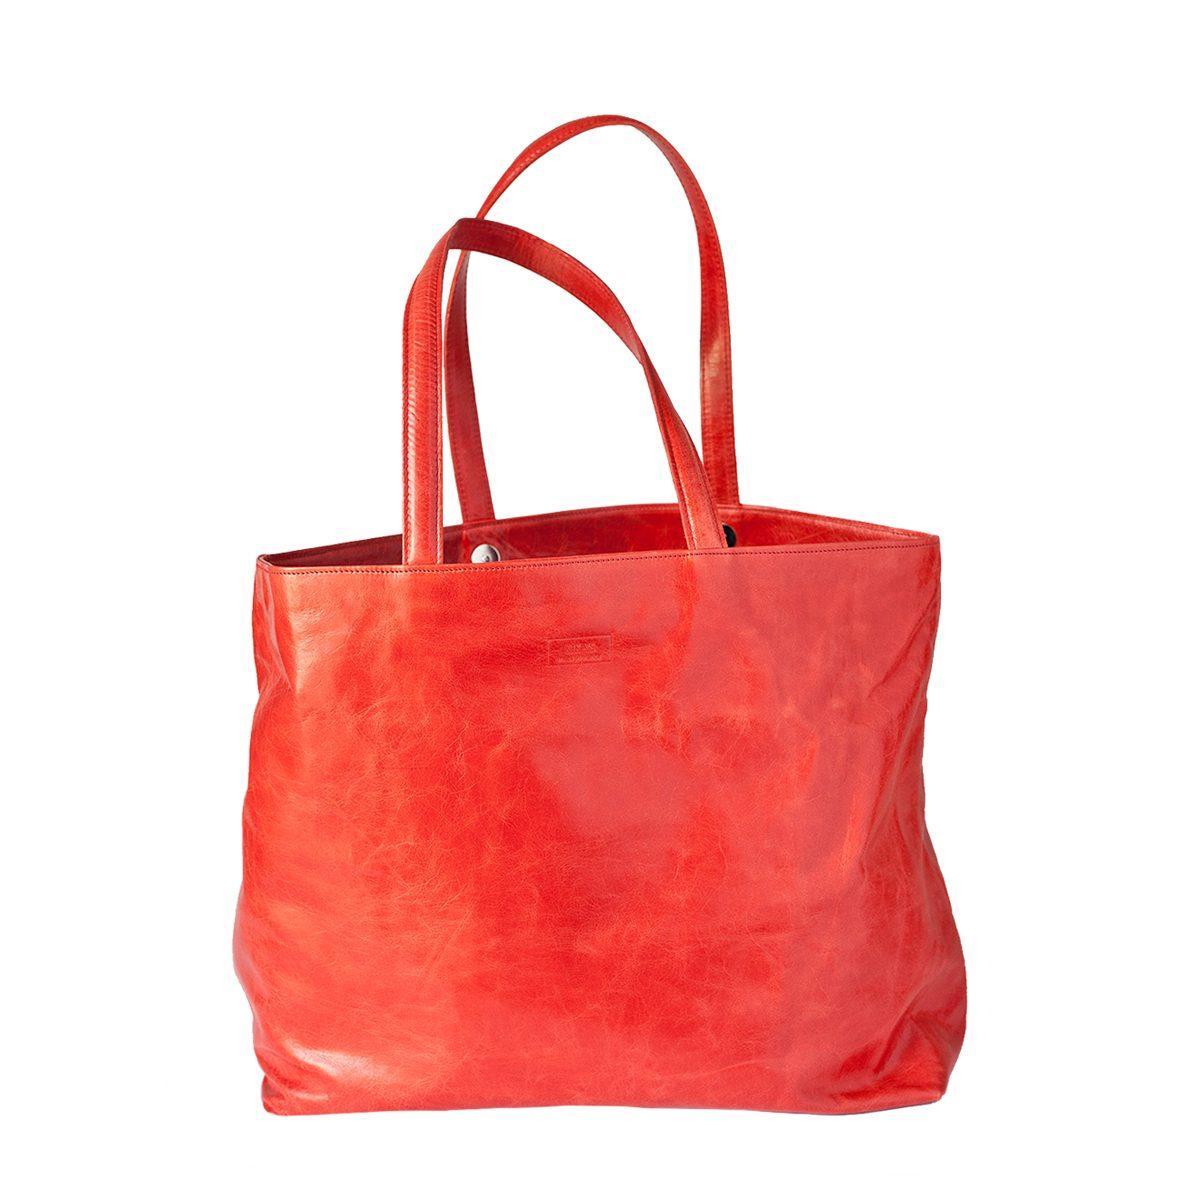 Grand sac cabas fourre-tout en cuir